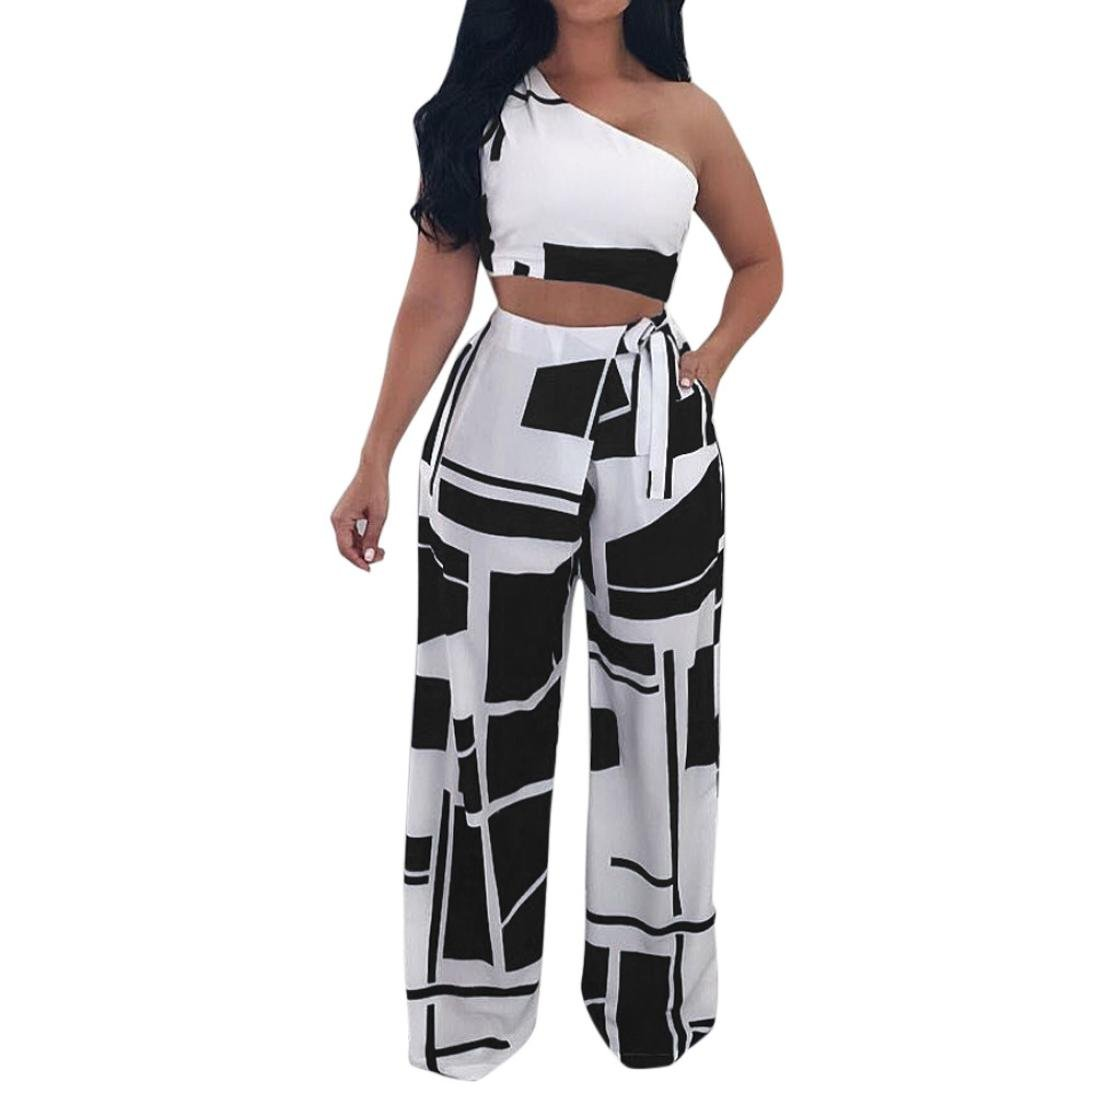 Hatoppy Women Nightclub Fashion Clothes Club Sexy Strapless Bandage Two Piece Set (XL, Black)